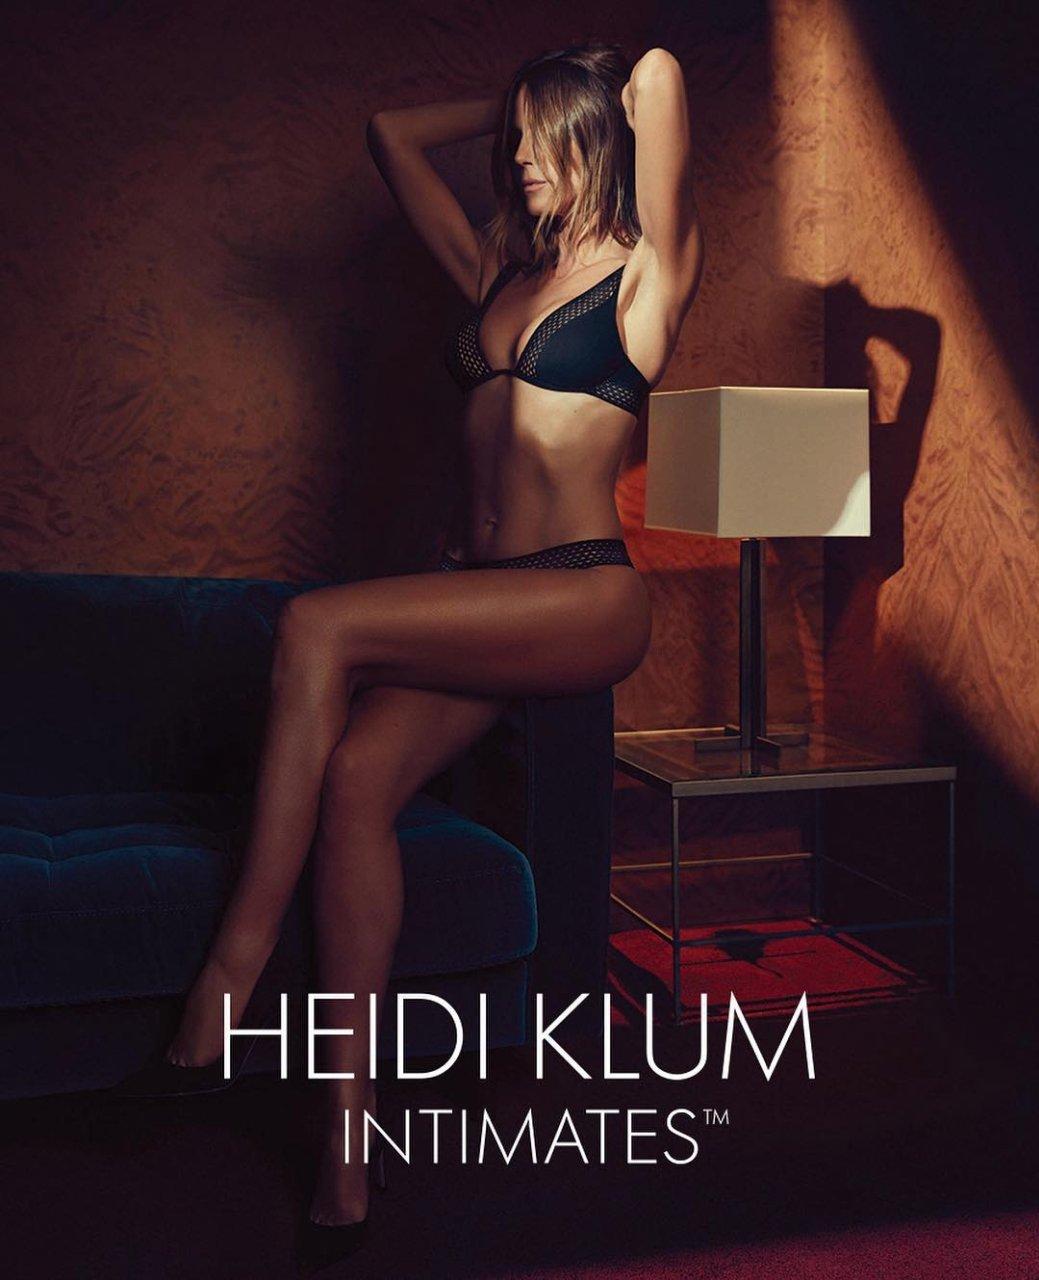 Heidi klum photos   amateurebonyporn.com